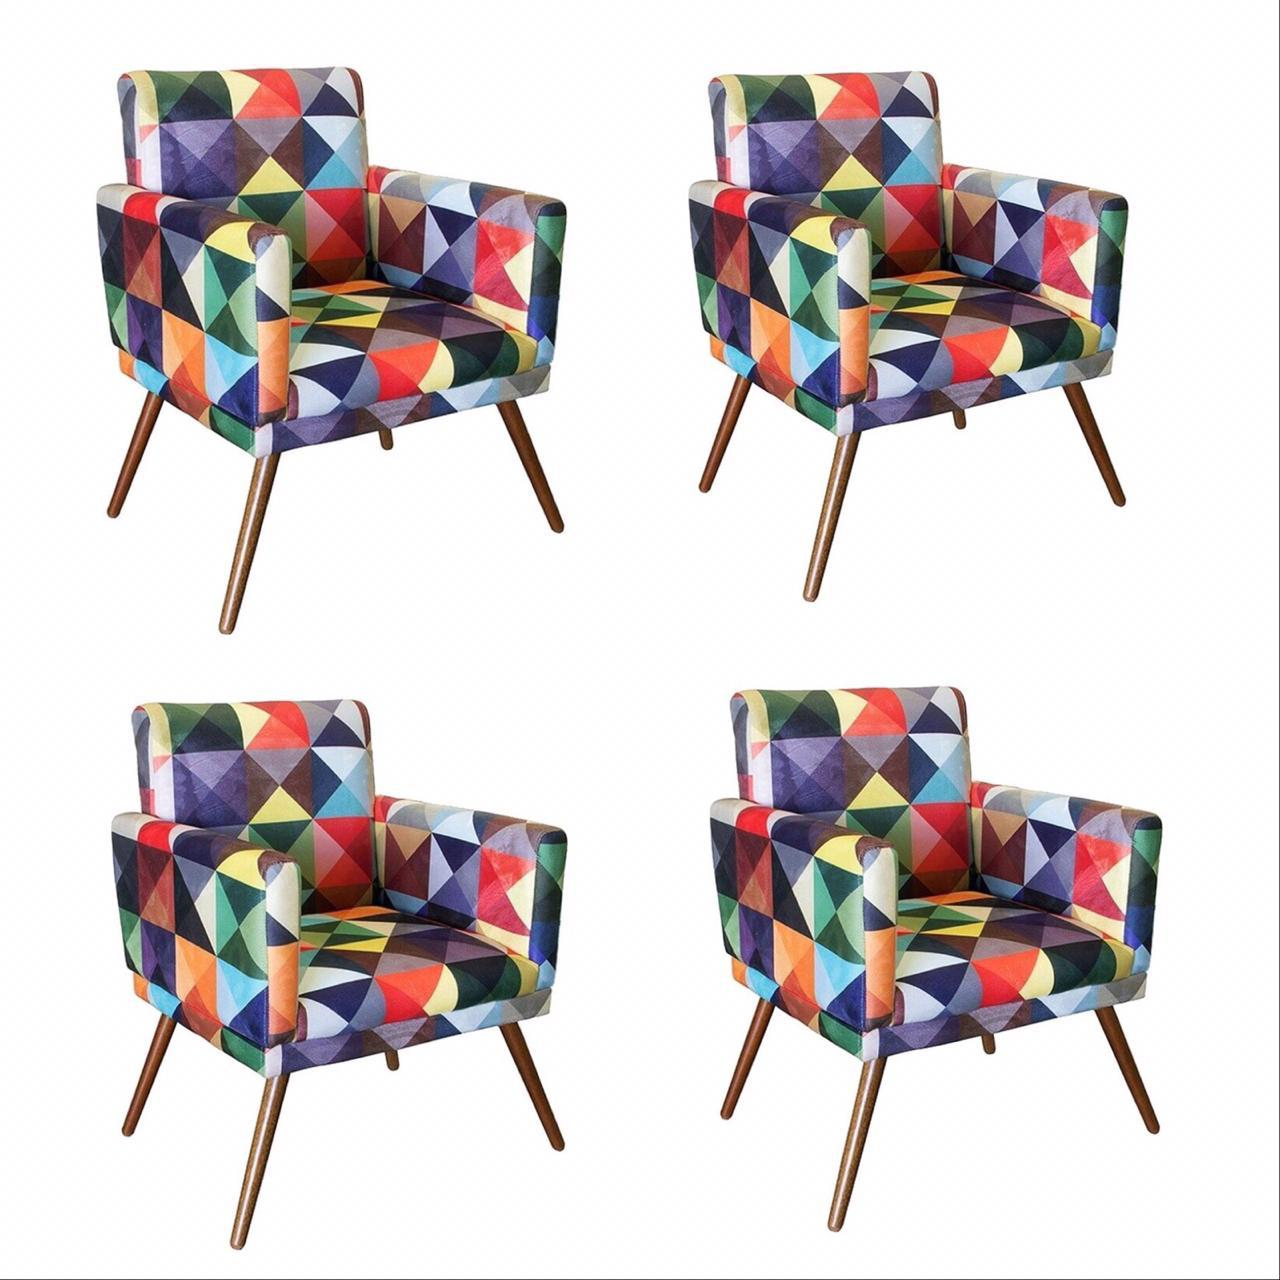 Kit 04 Poltrona Decorativa Nina com rodapés Triângulos- Bela Casa Shop